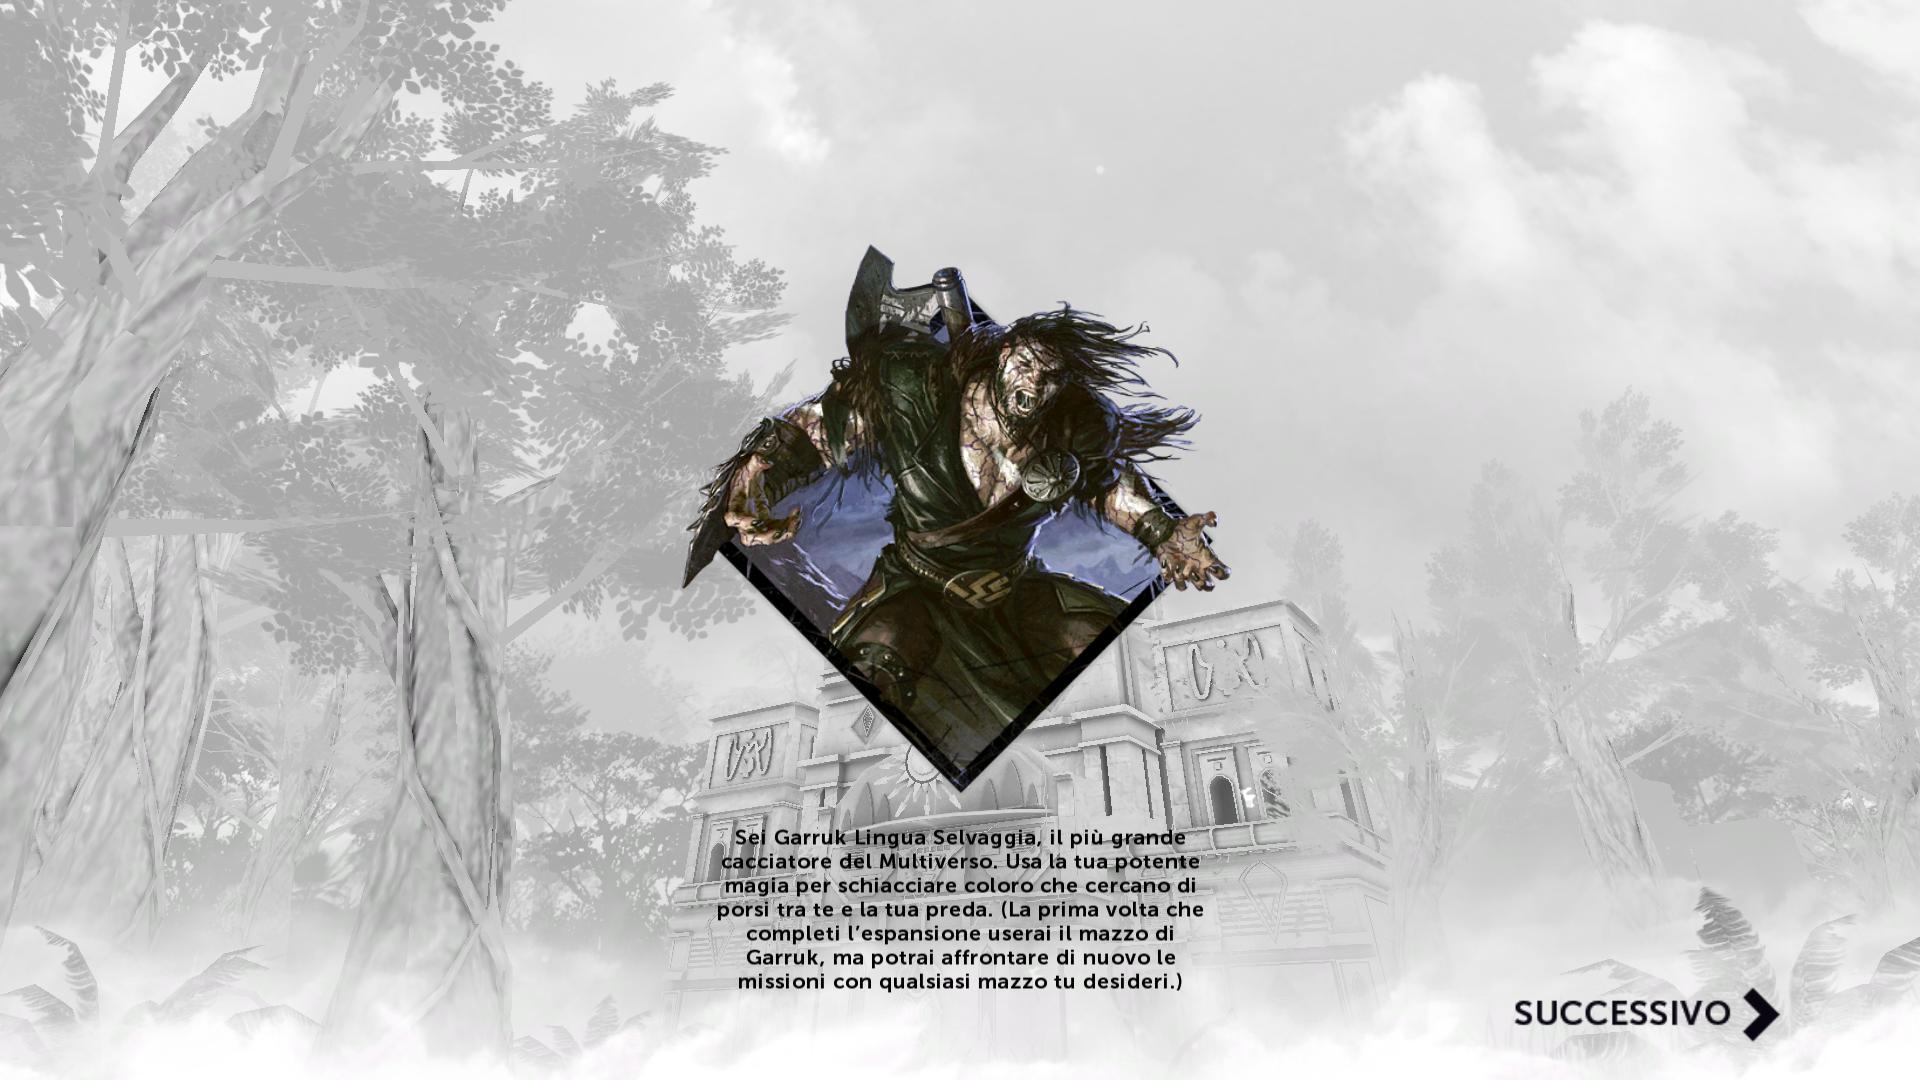 5. Avatar transition Screen into Garruk